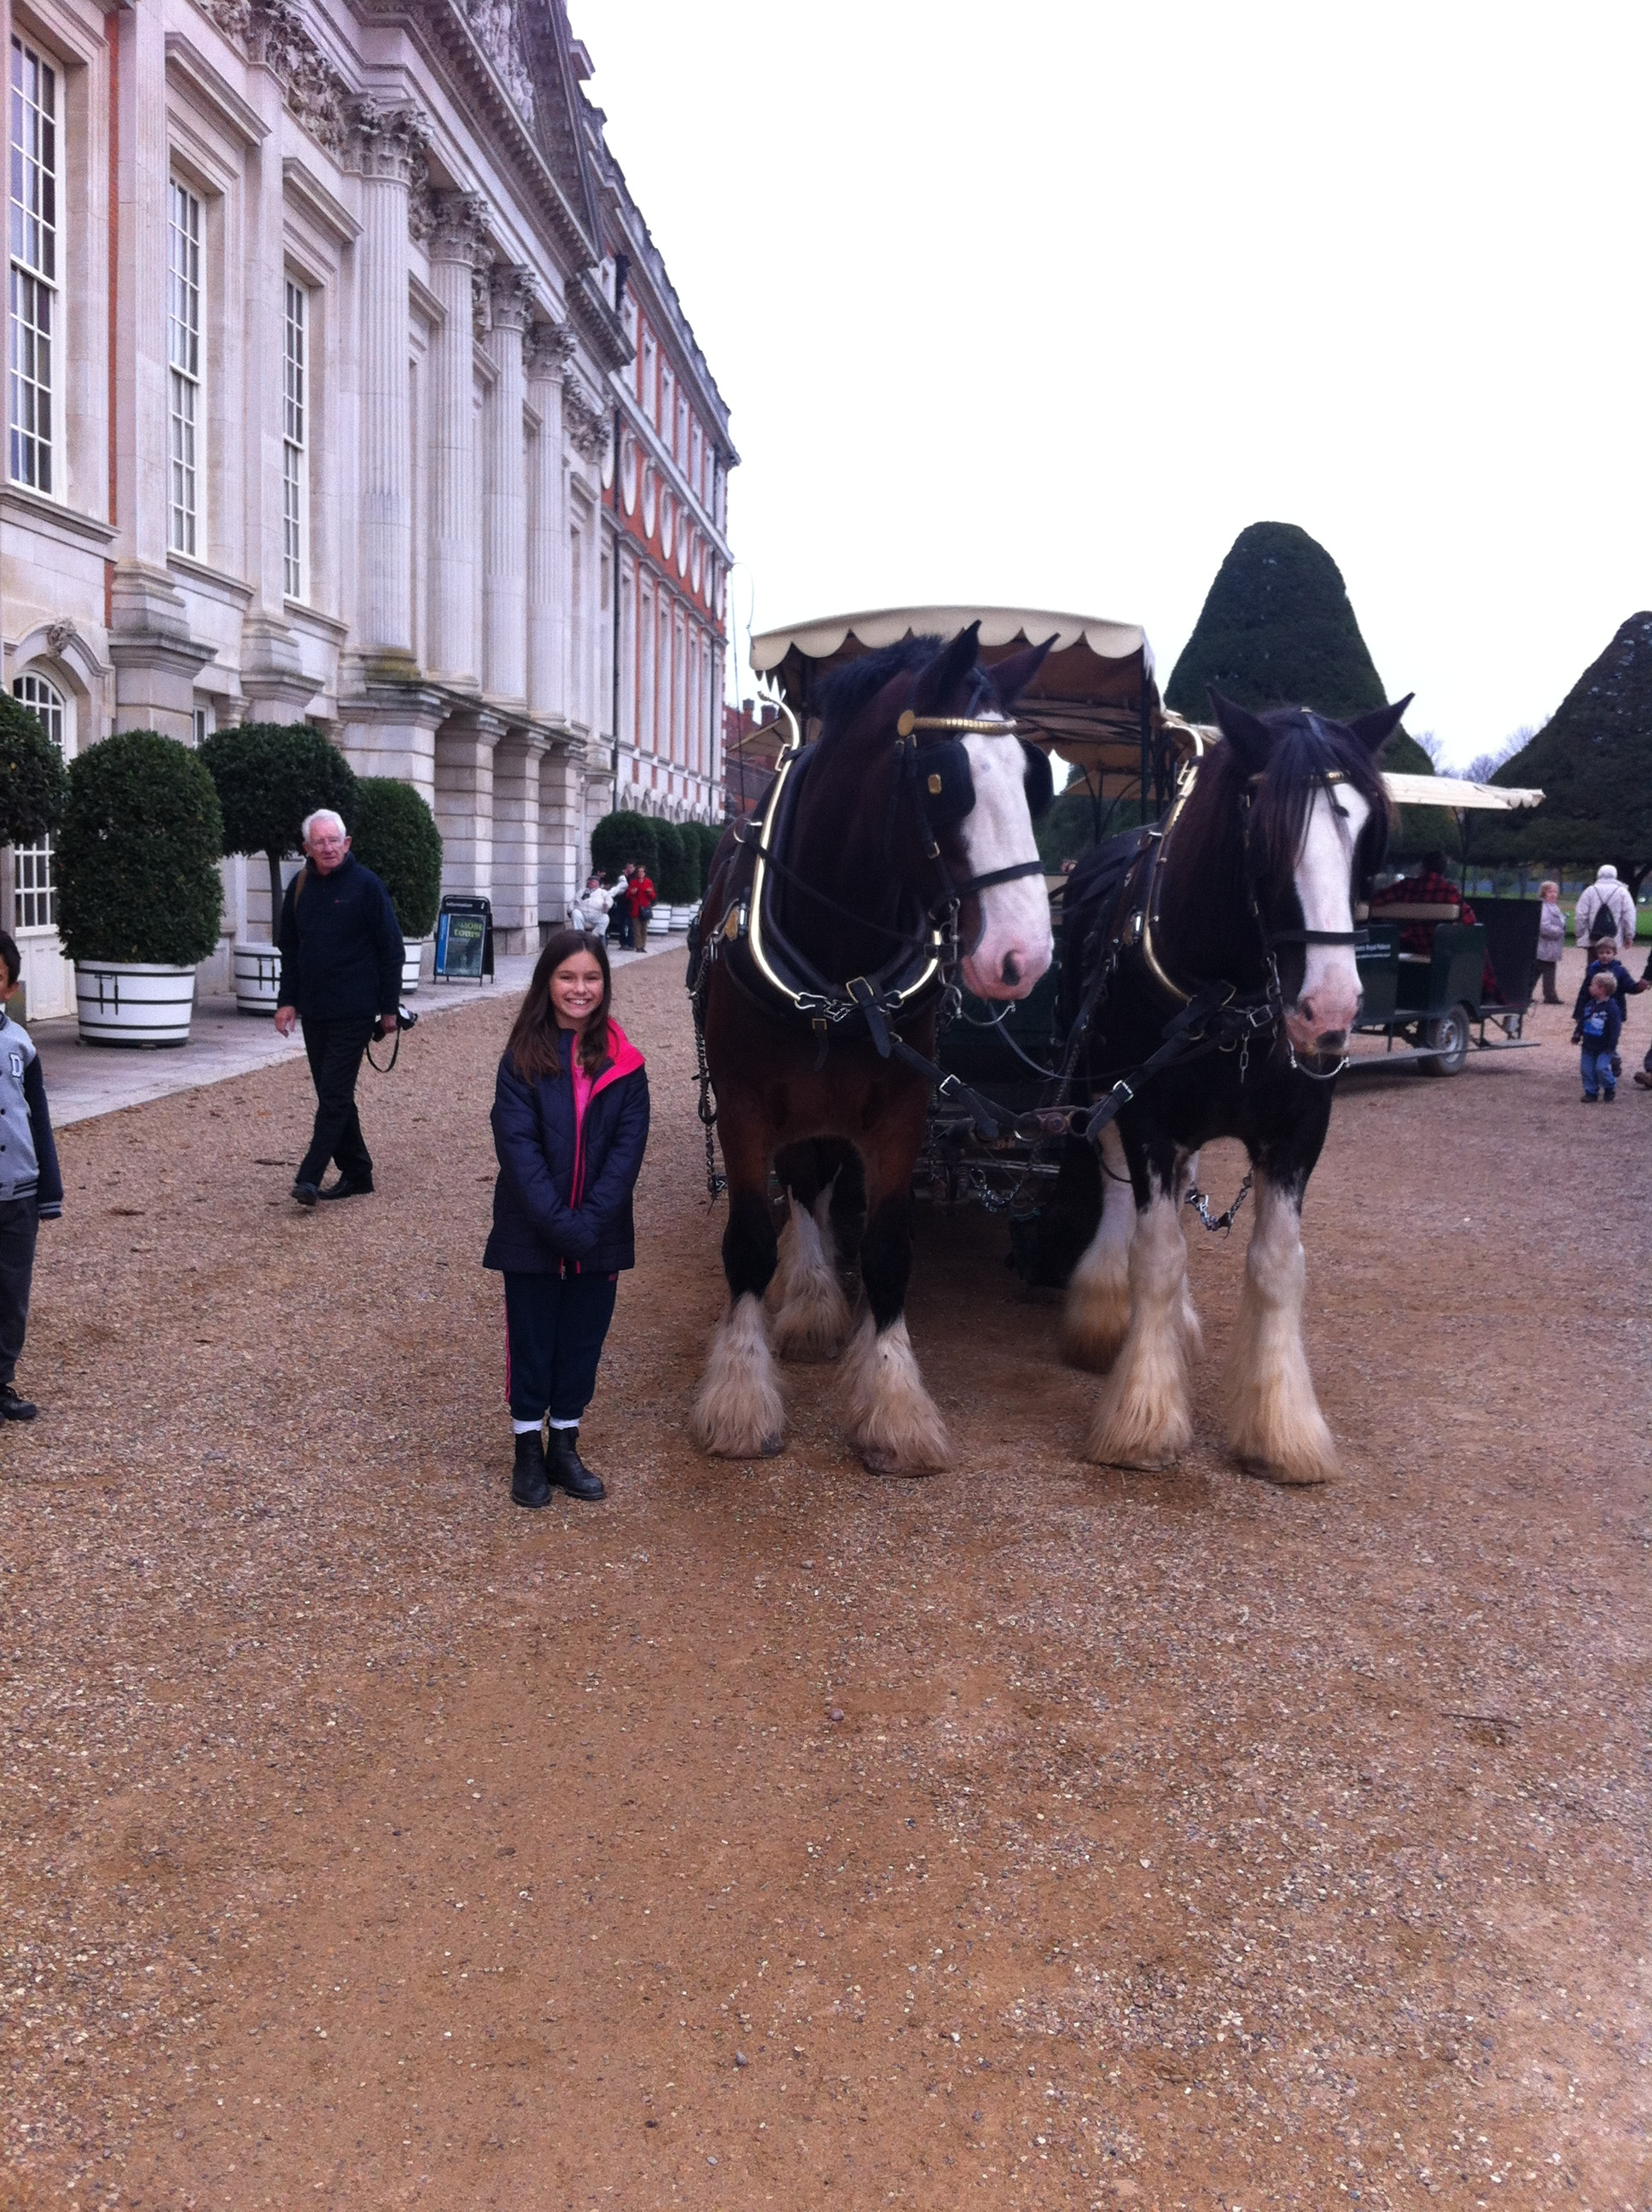 Carridge Ride at Hampton court